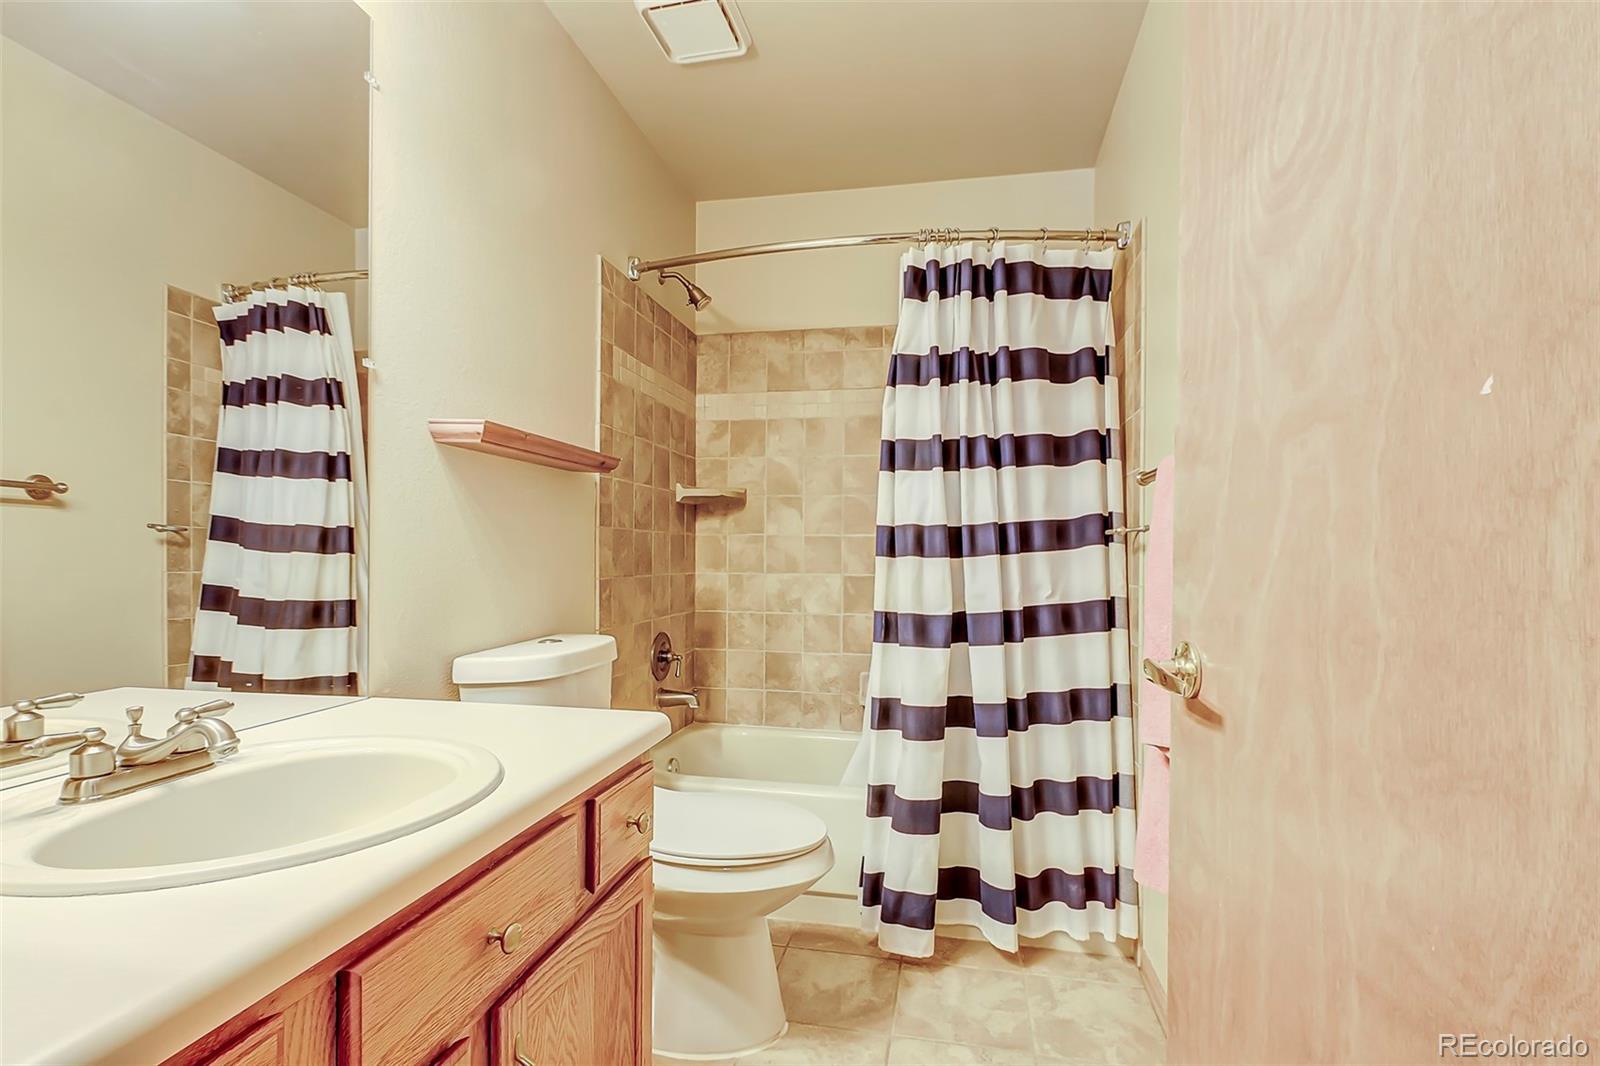 MLS# 4204081 - 15 - 2911 White Oak Trail, Highlands Ranch, CO 80129